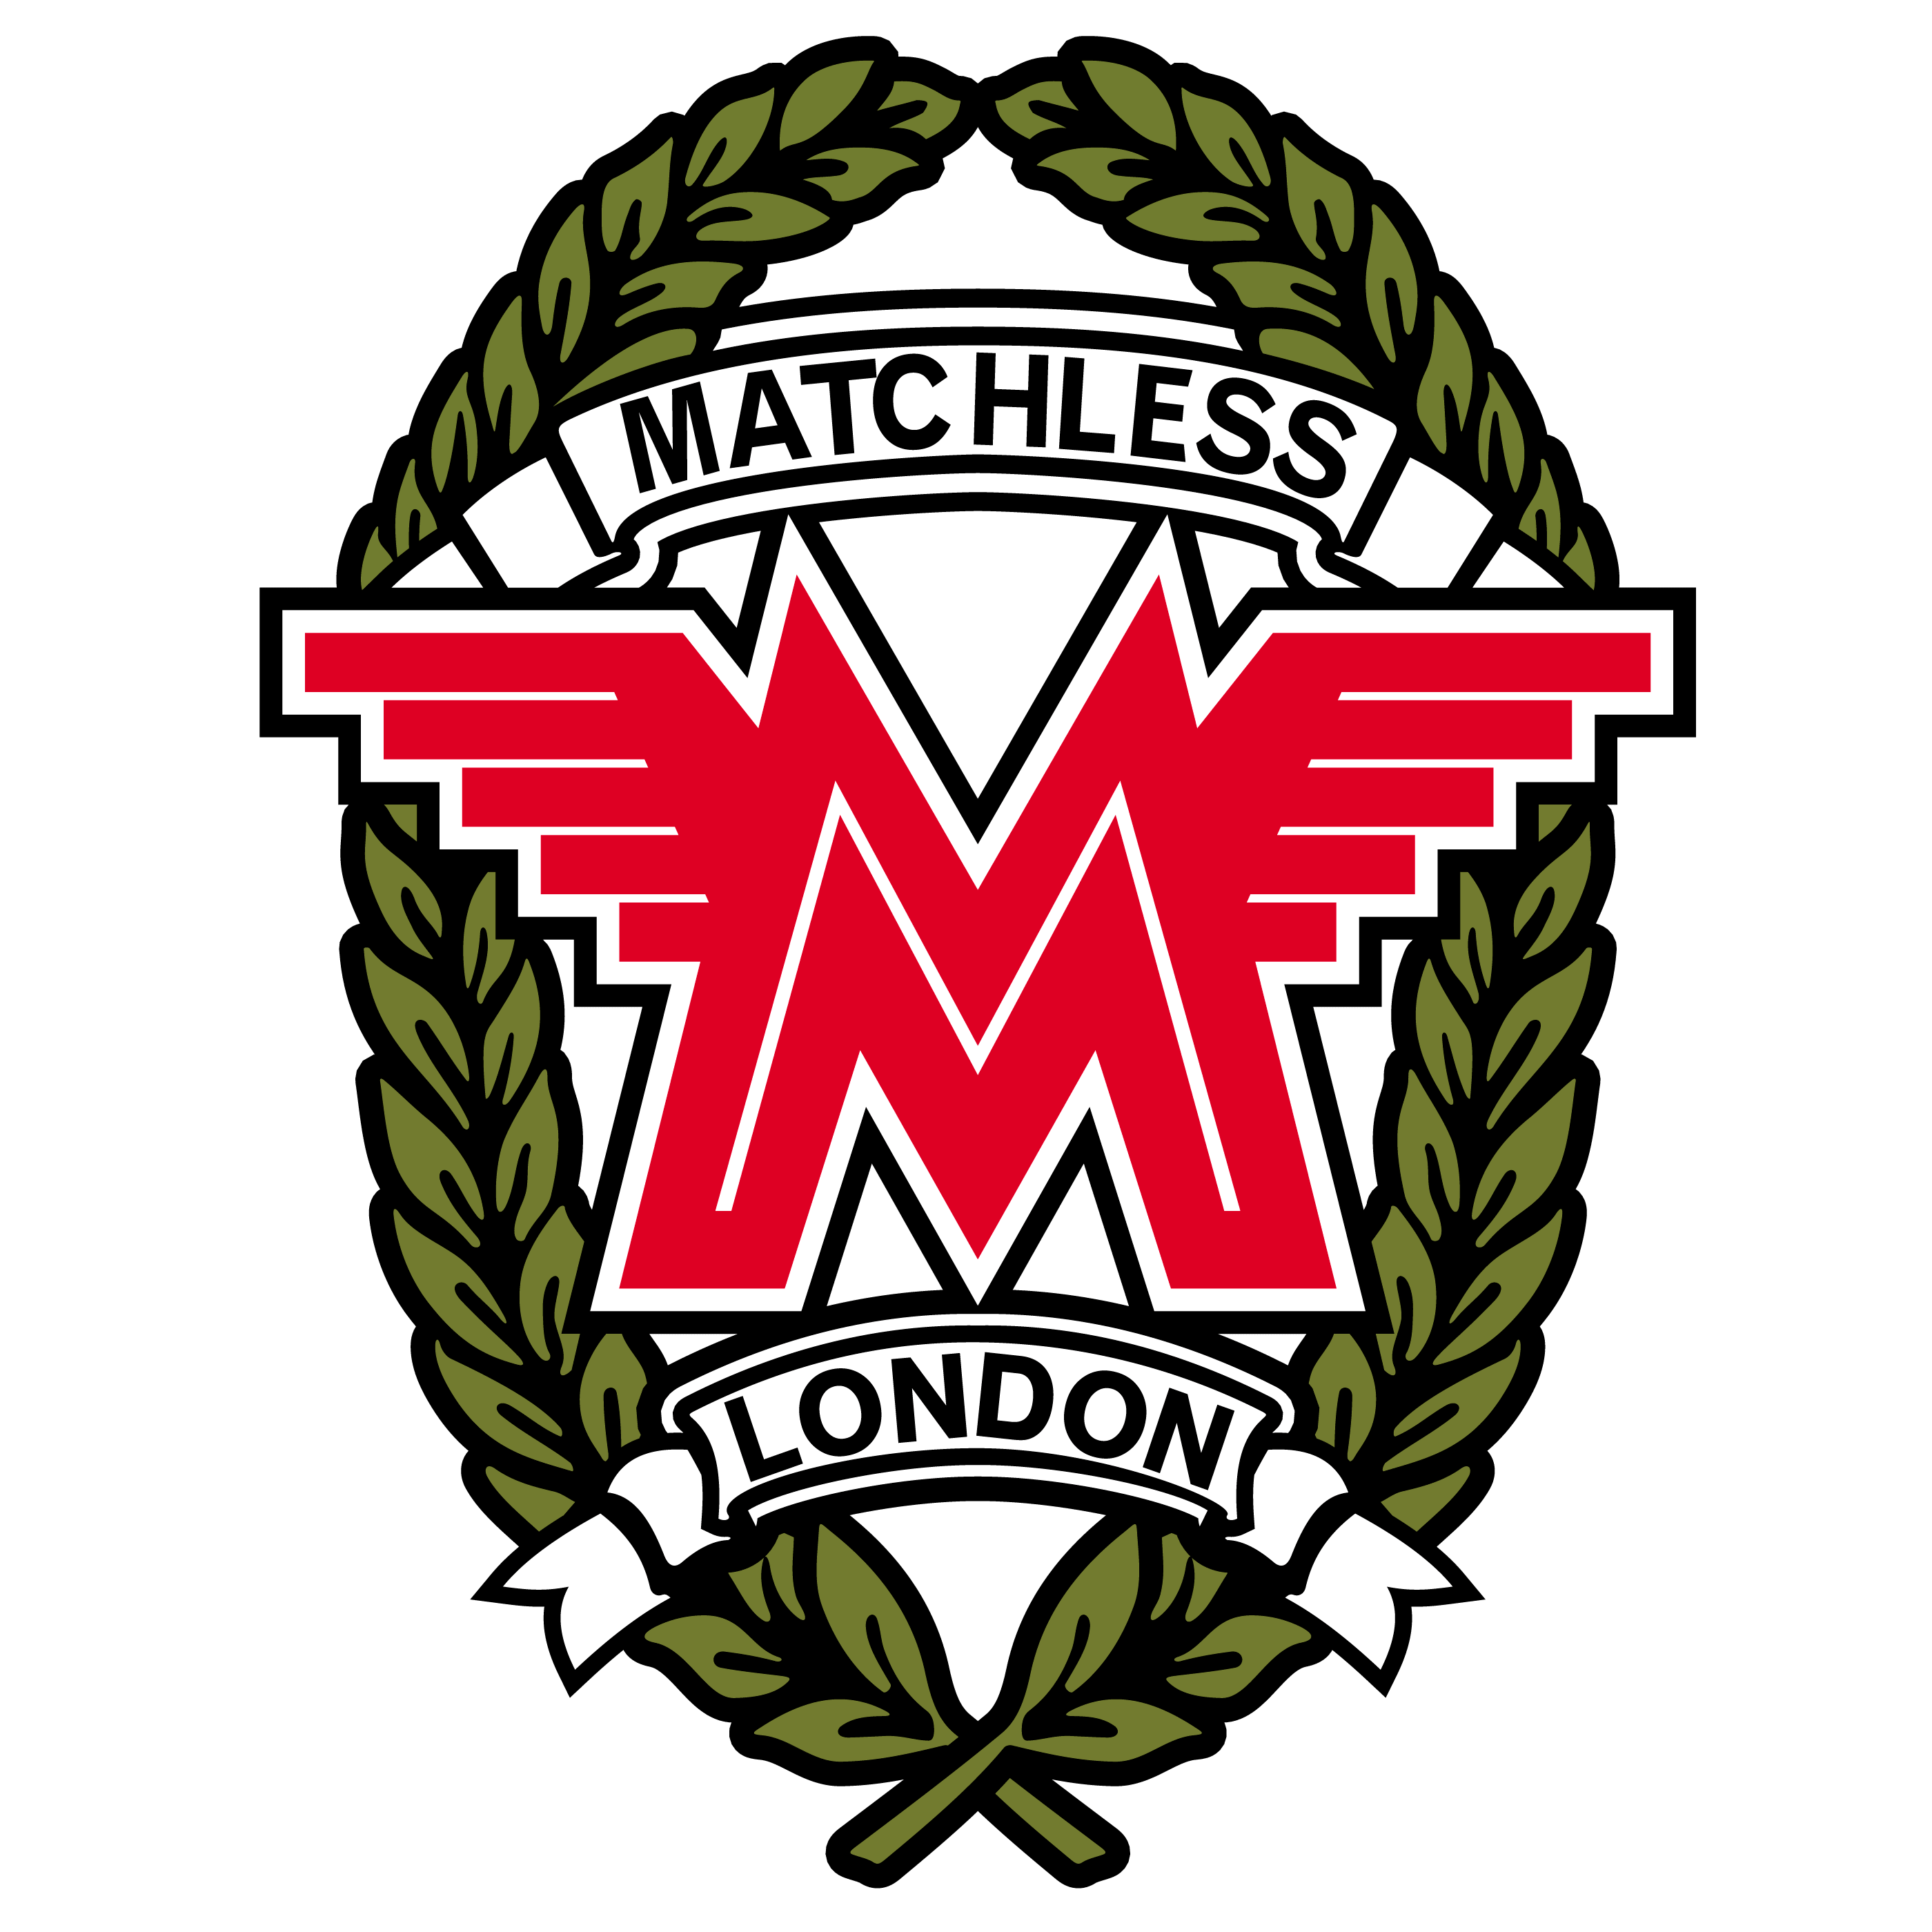 Matchless Motorcycle Logo.